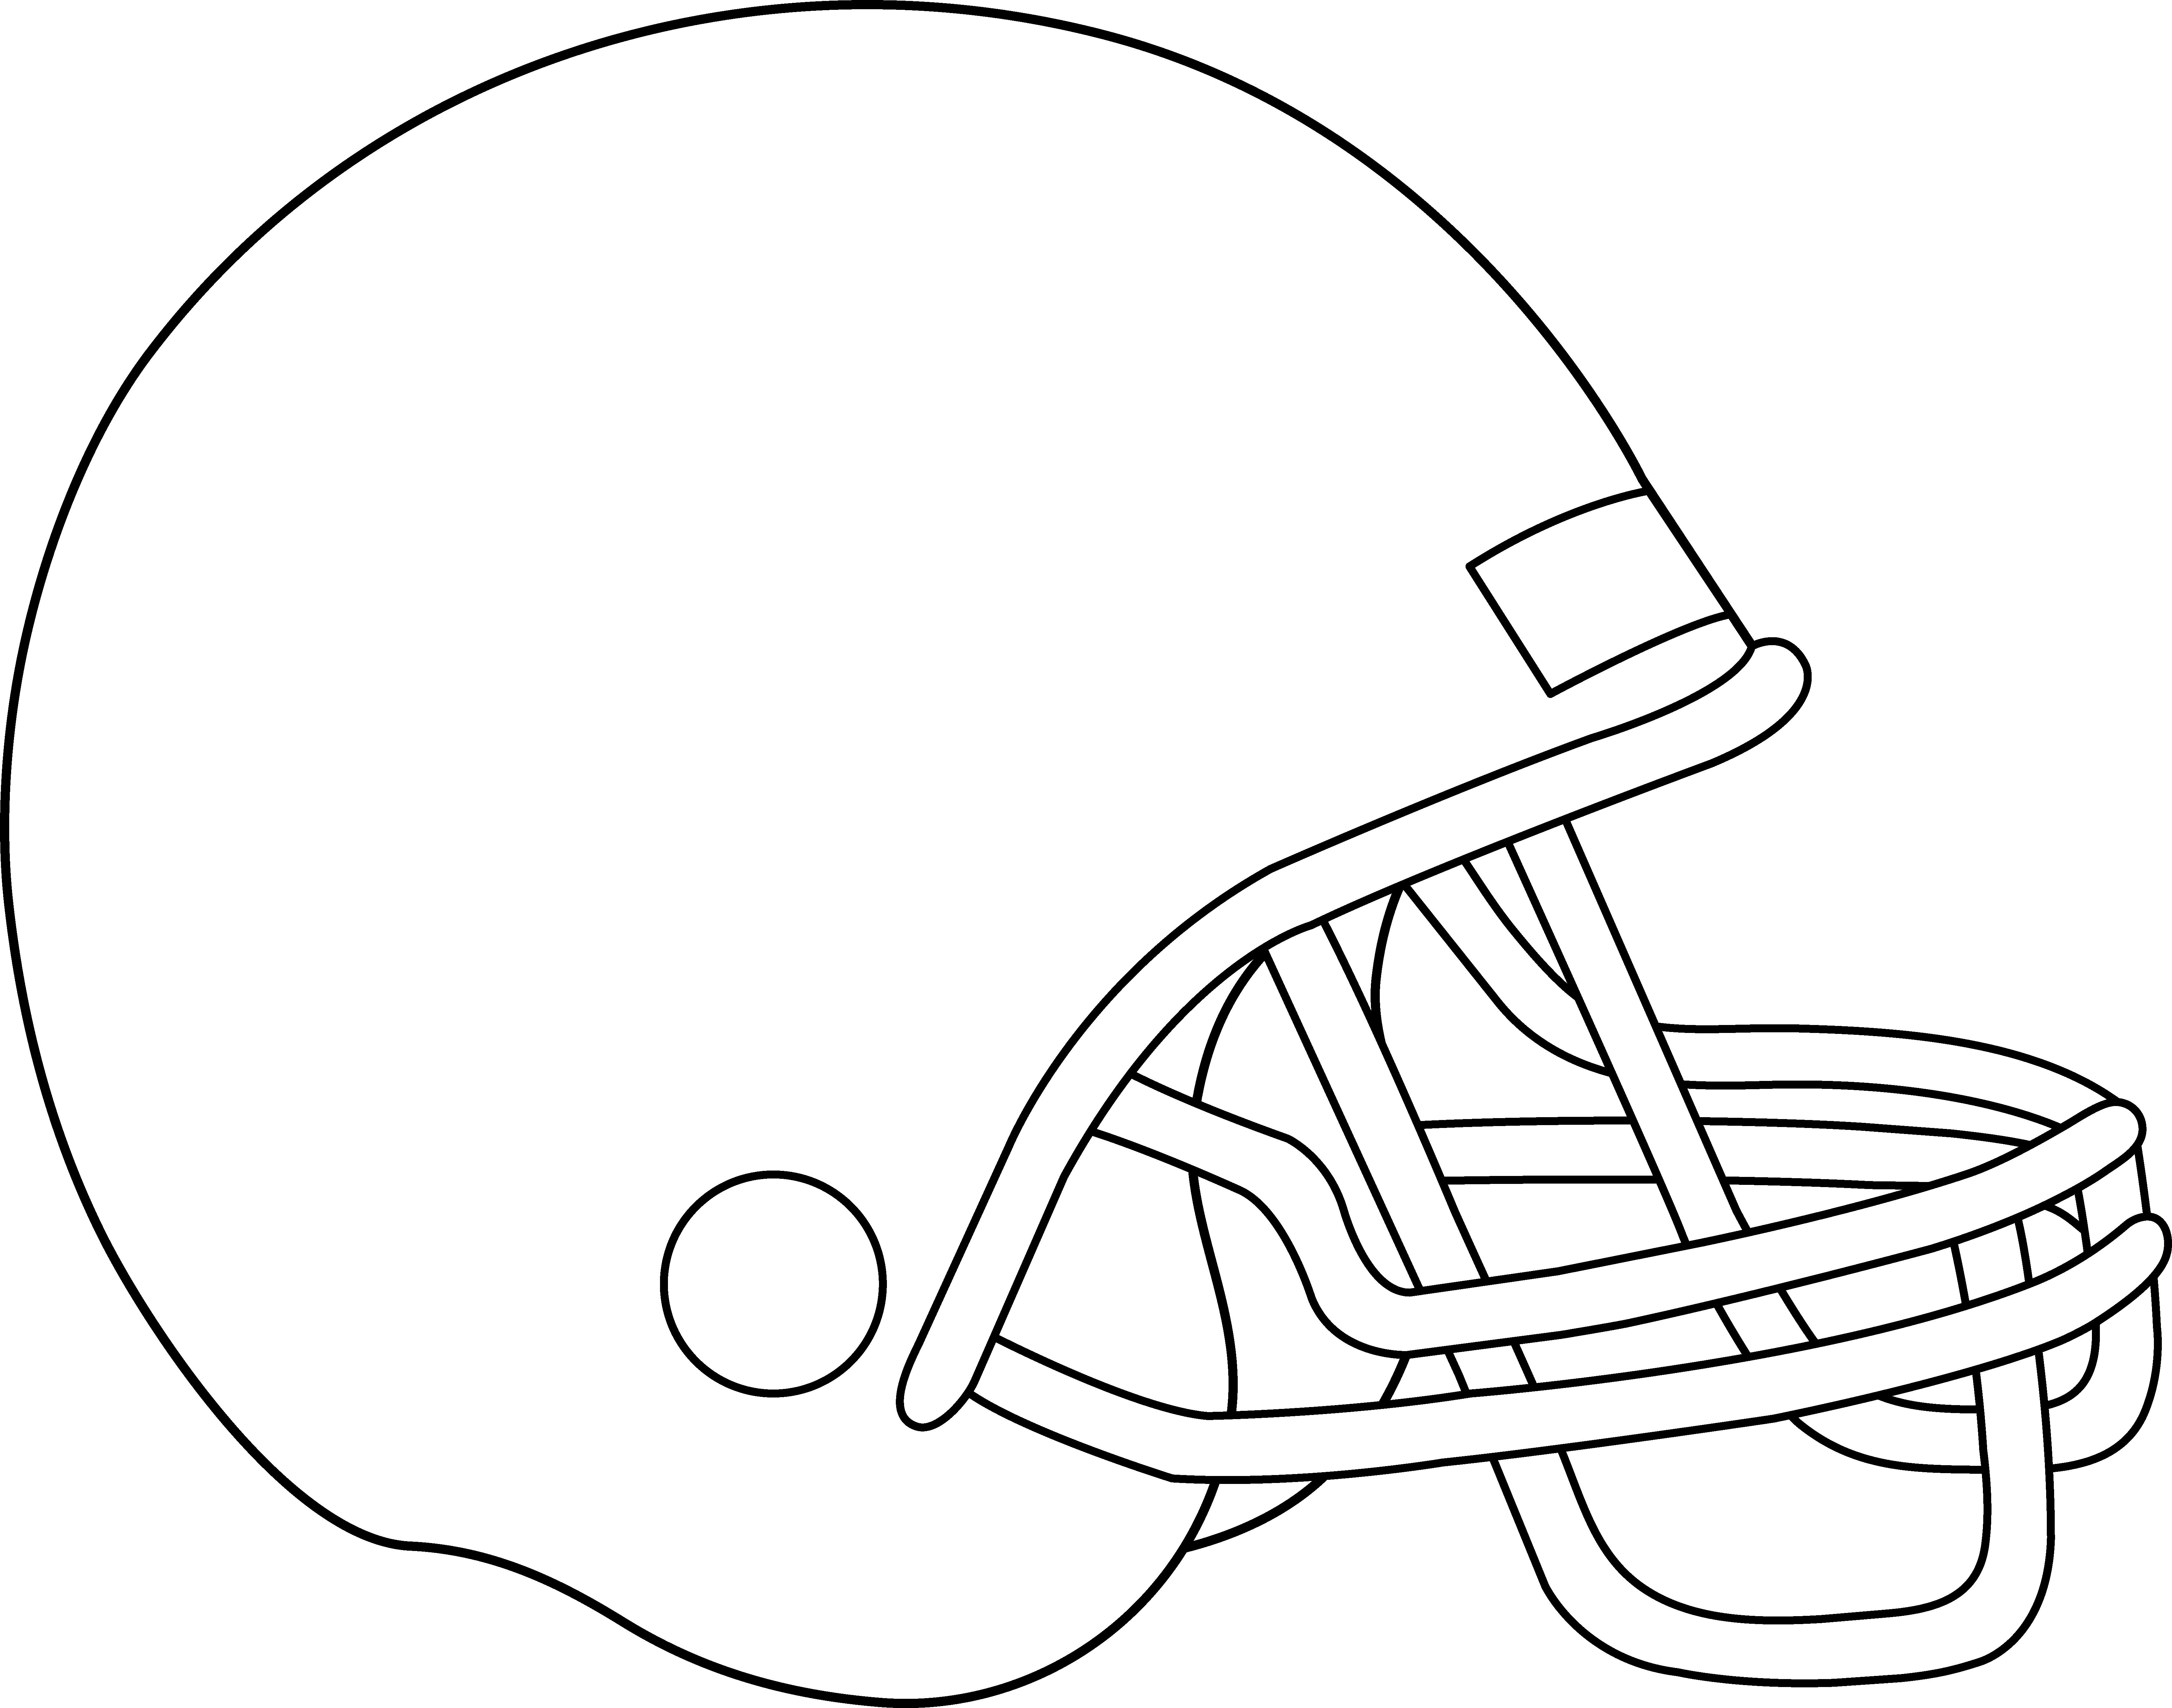 6835x5374 Blank Football Helmet For Coloring